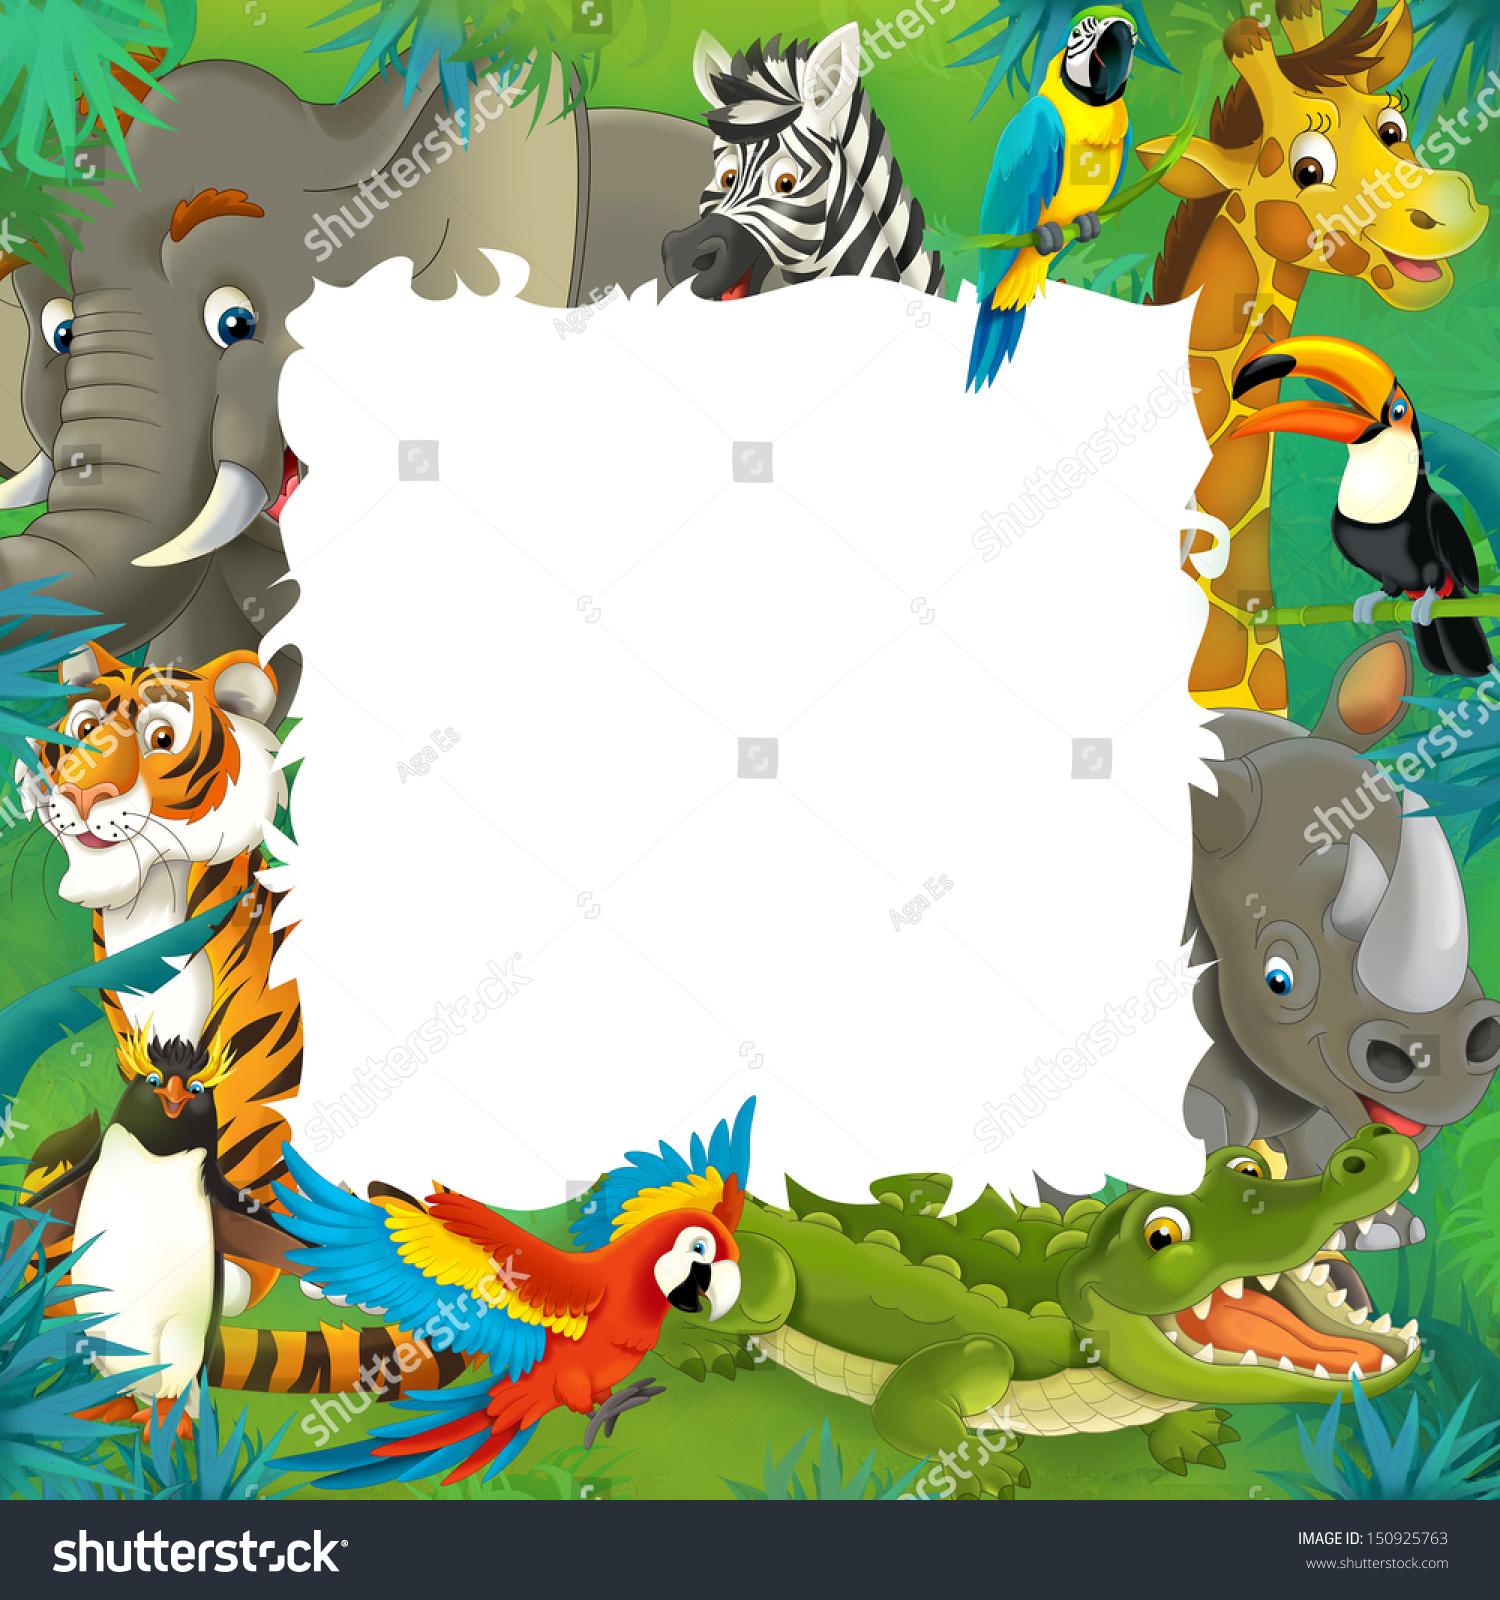 SoHo 1234 Jungle Friends Baby Crib Nursery Bedding Set 13